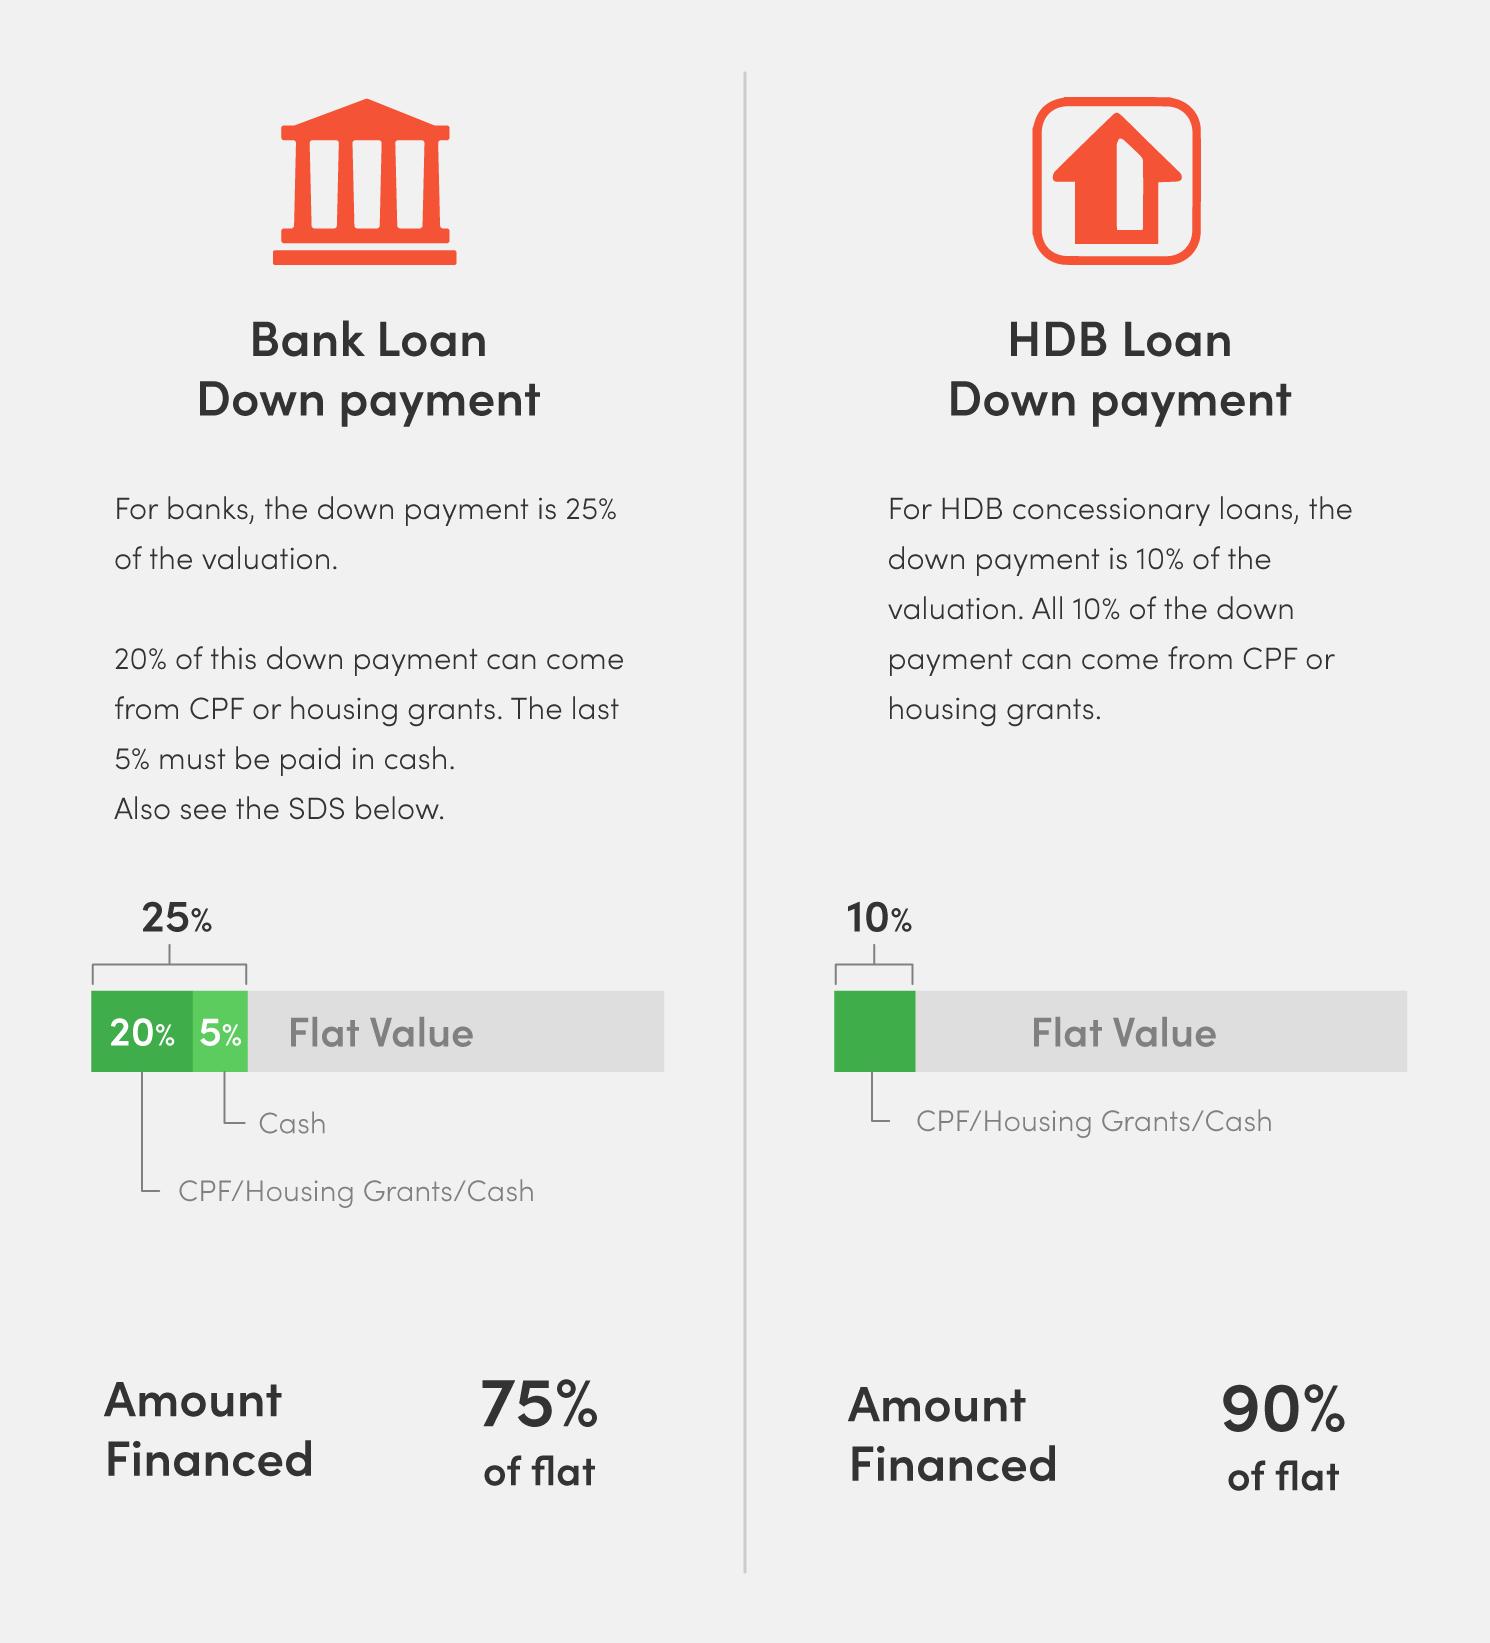 home loans in Singapore downpayment bank loan hdb loan